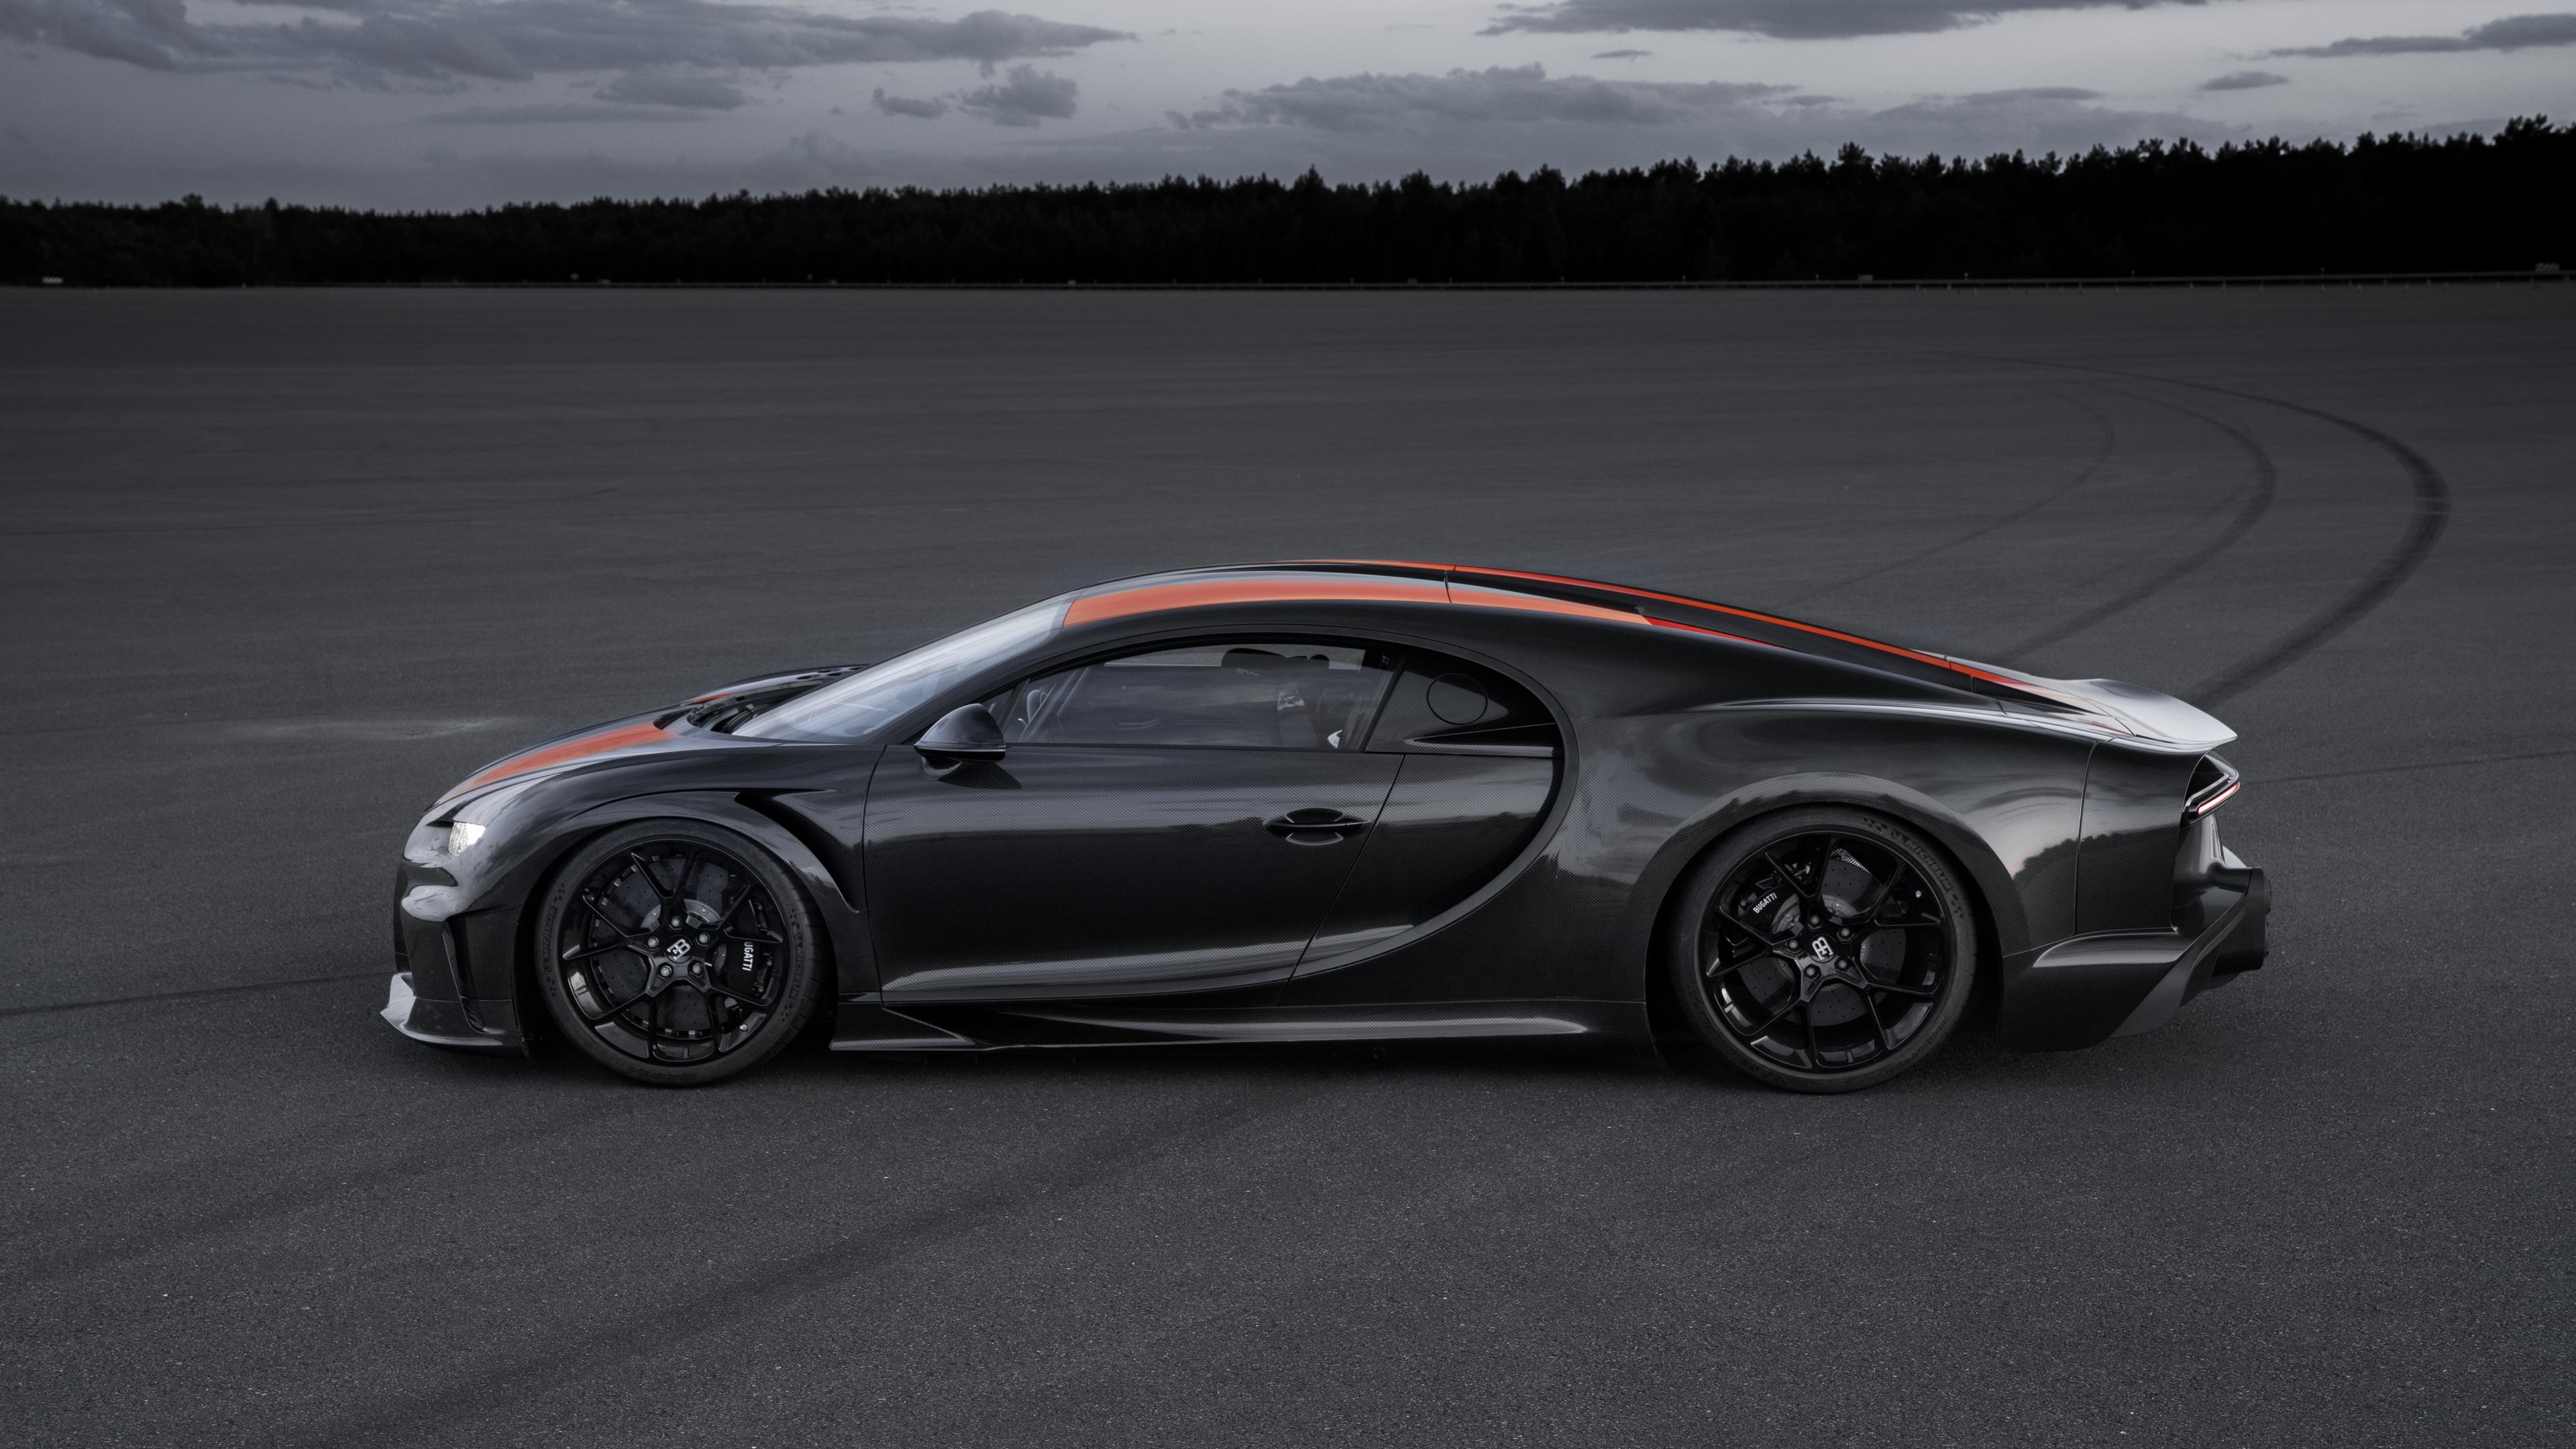 Wallpaper 4k Bugatti Chiron Prototype 2019 Side View 2019